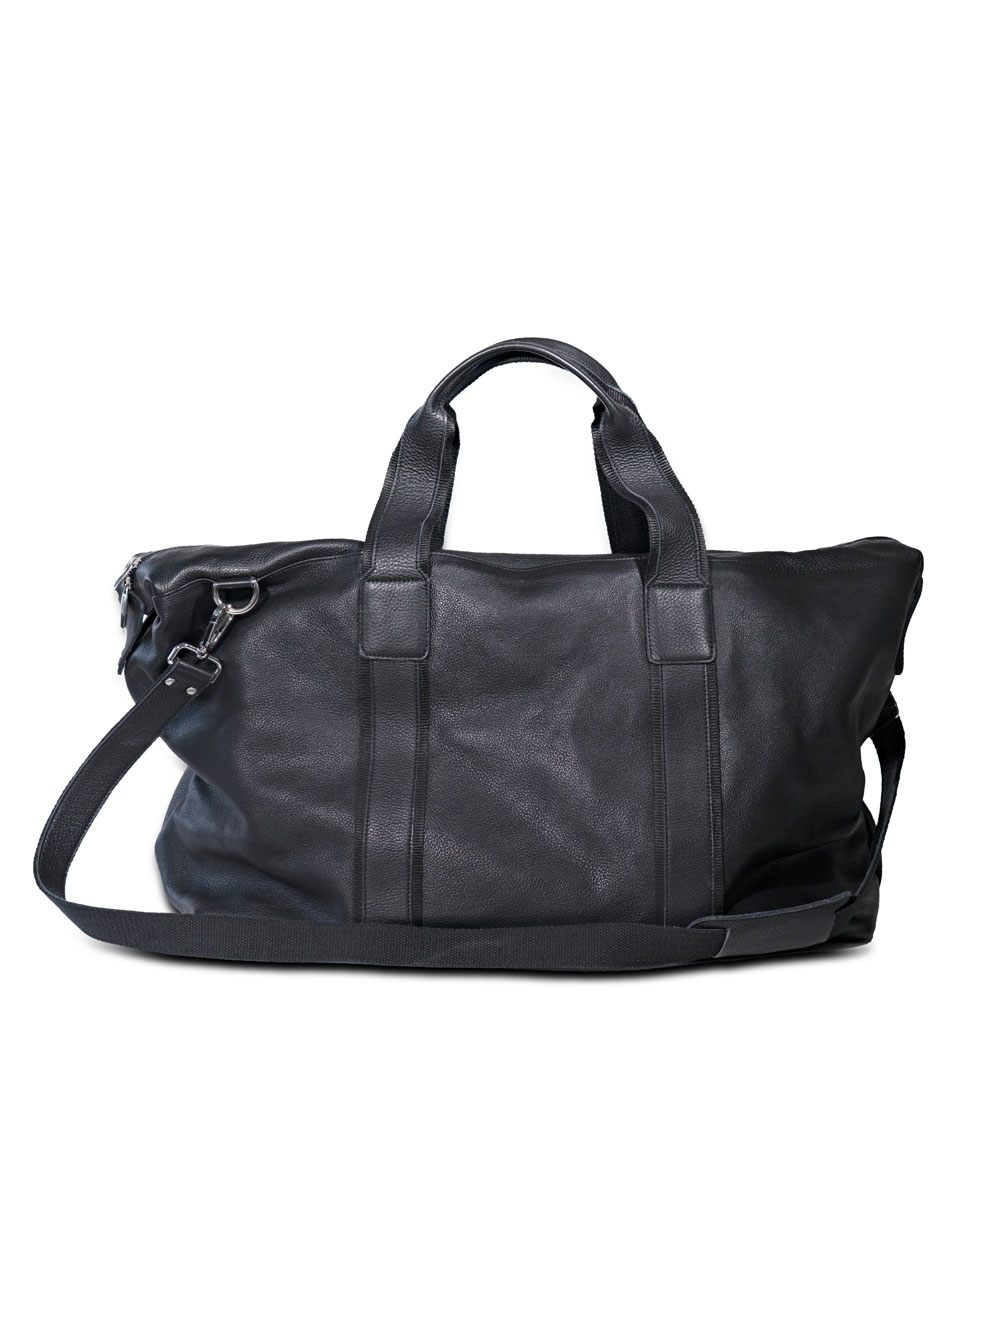 Roald Travel Bag